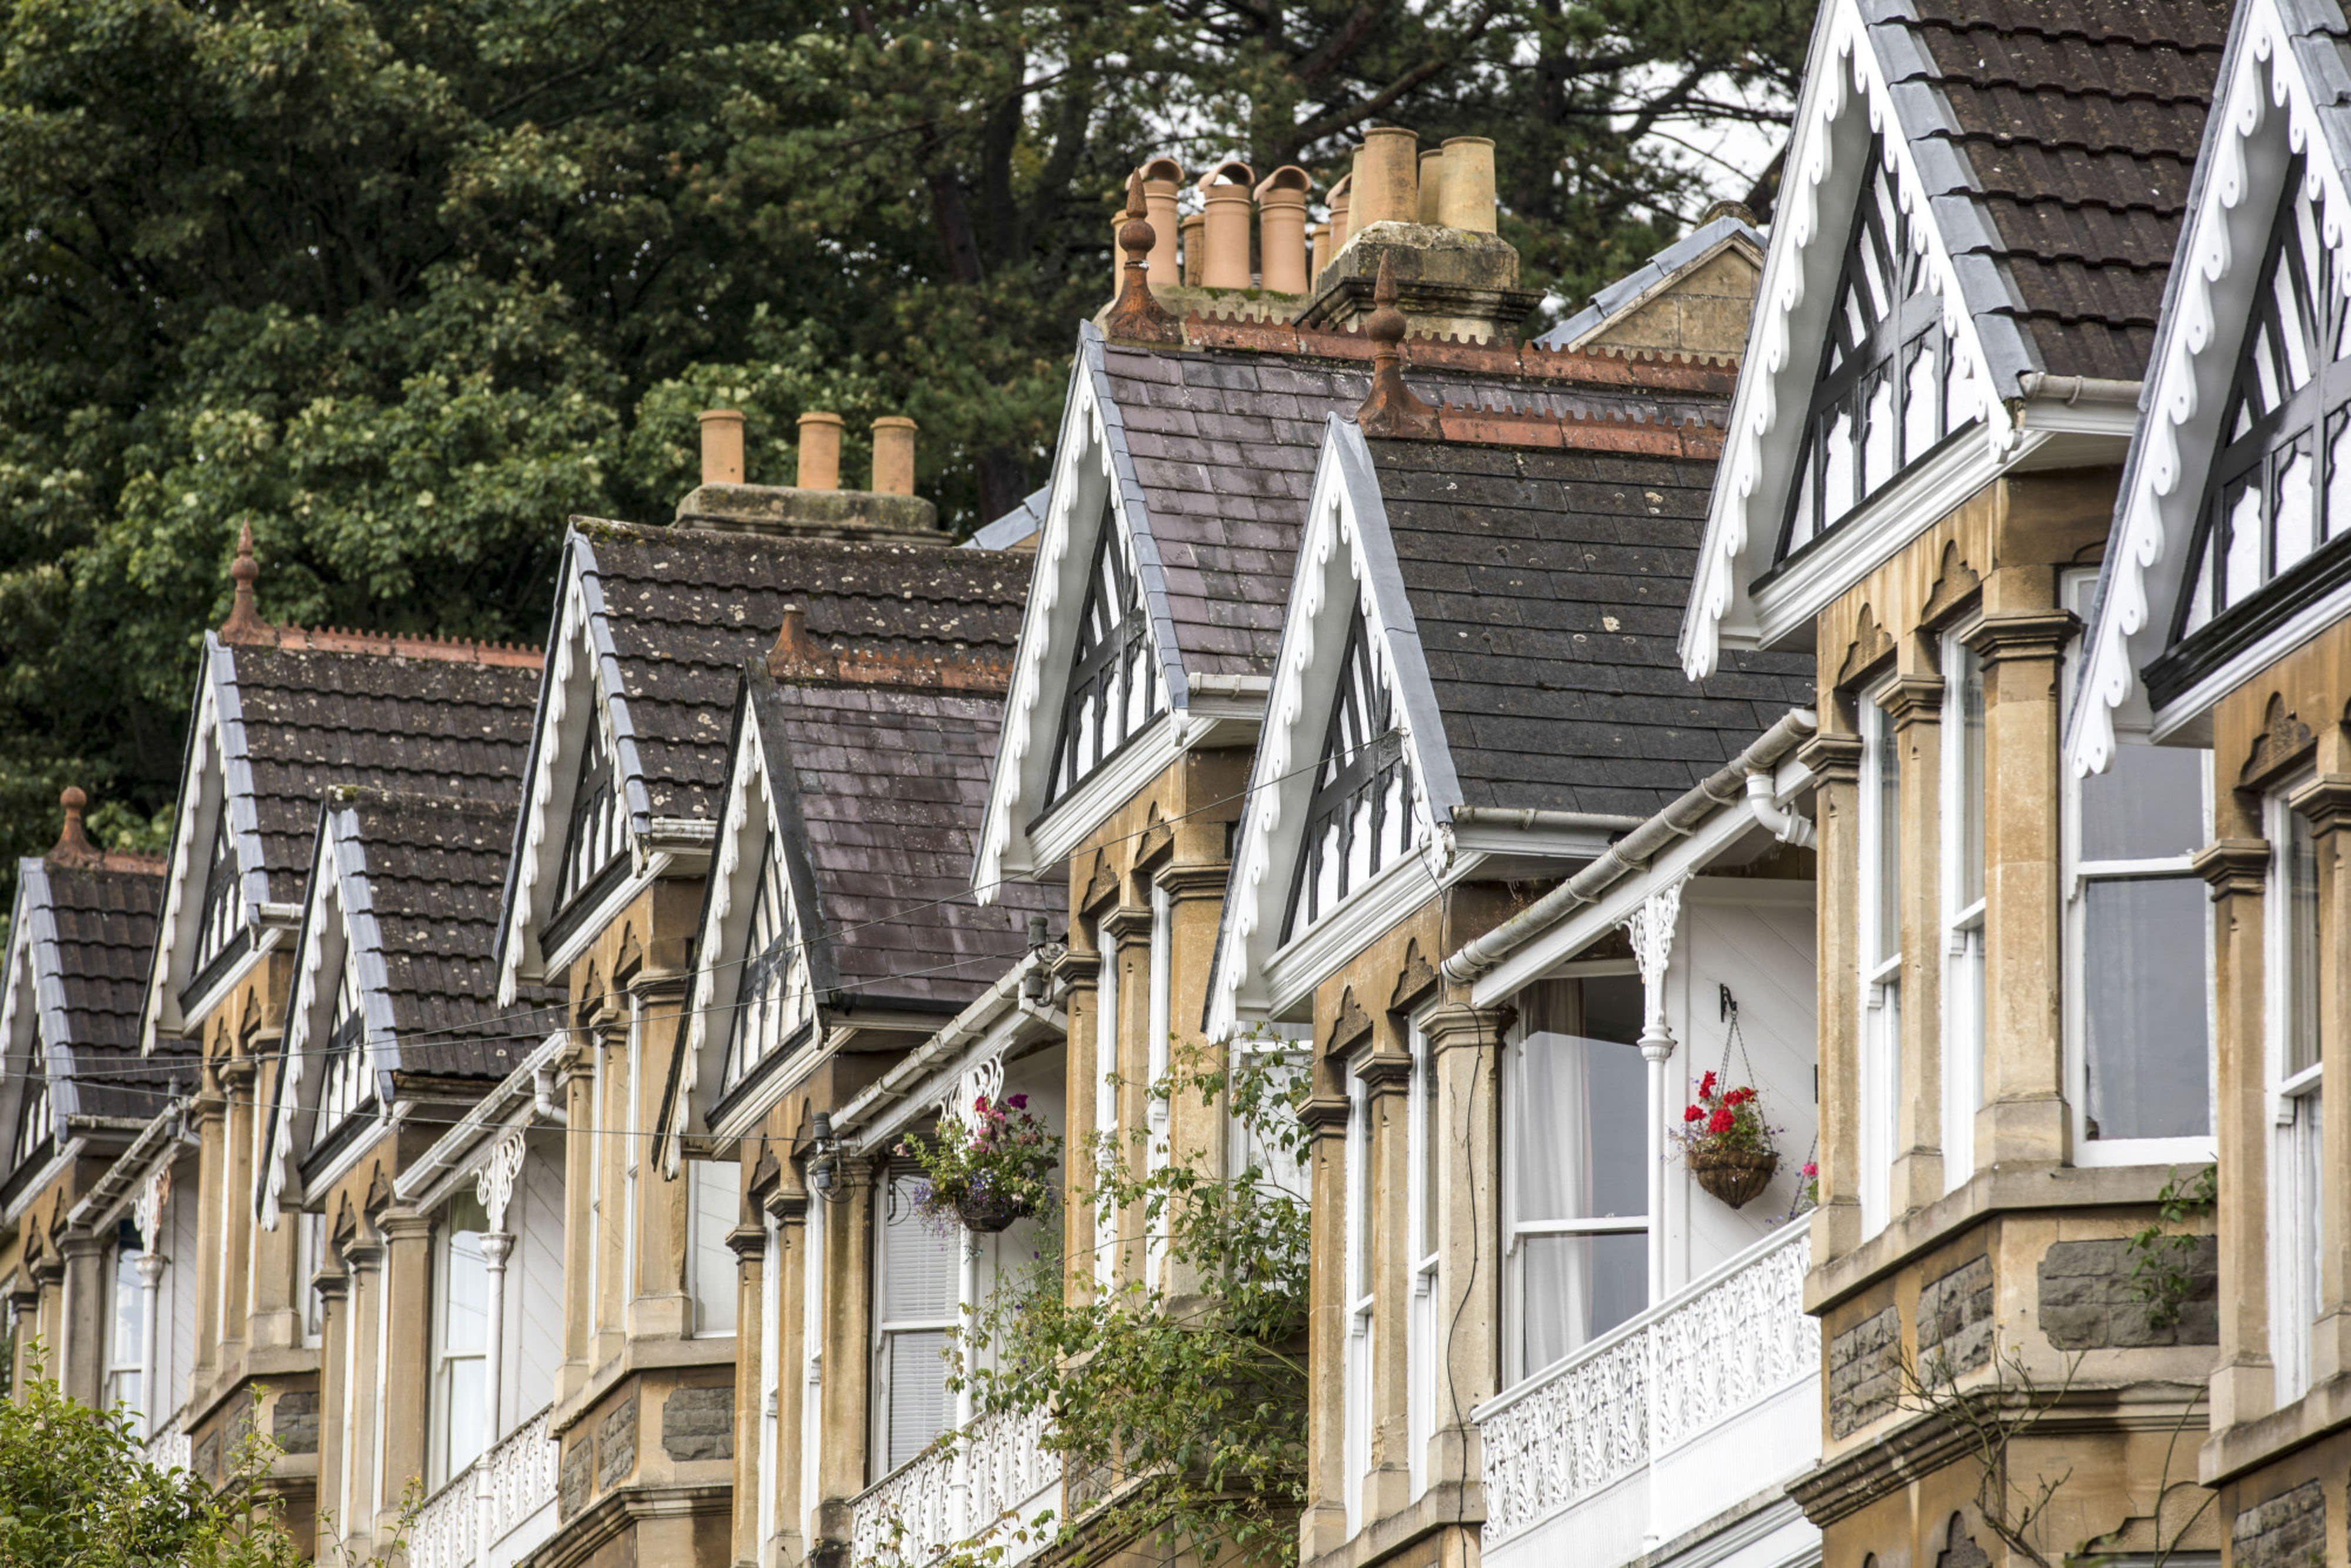 Mortgage Advice Bureau proposes a final dividend of 12.8p per share